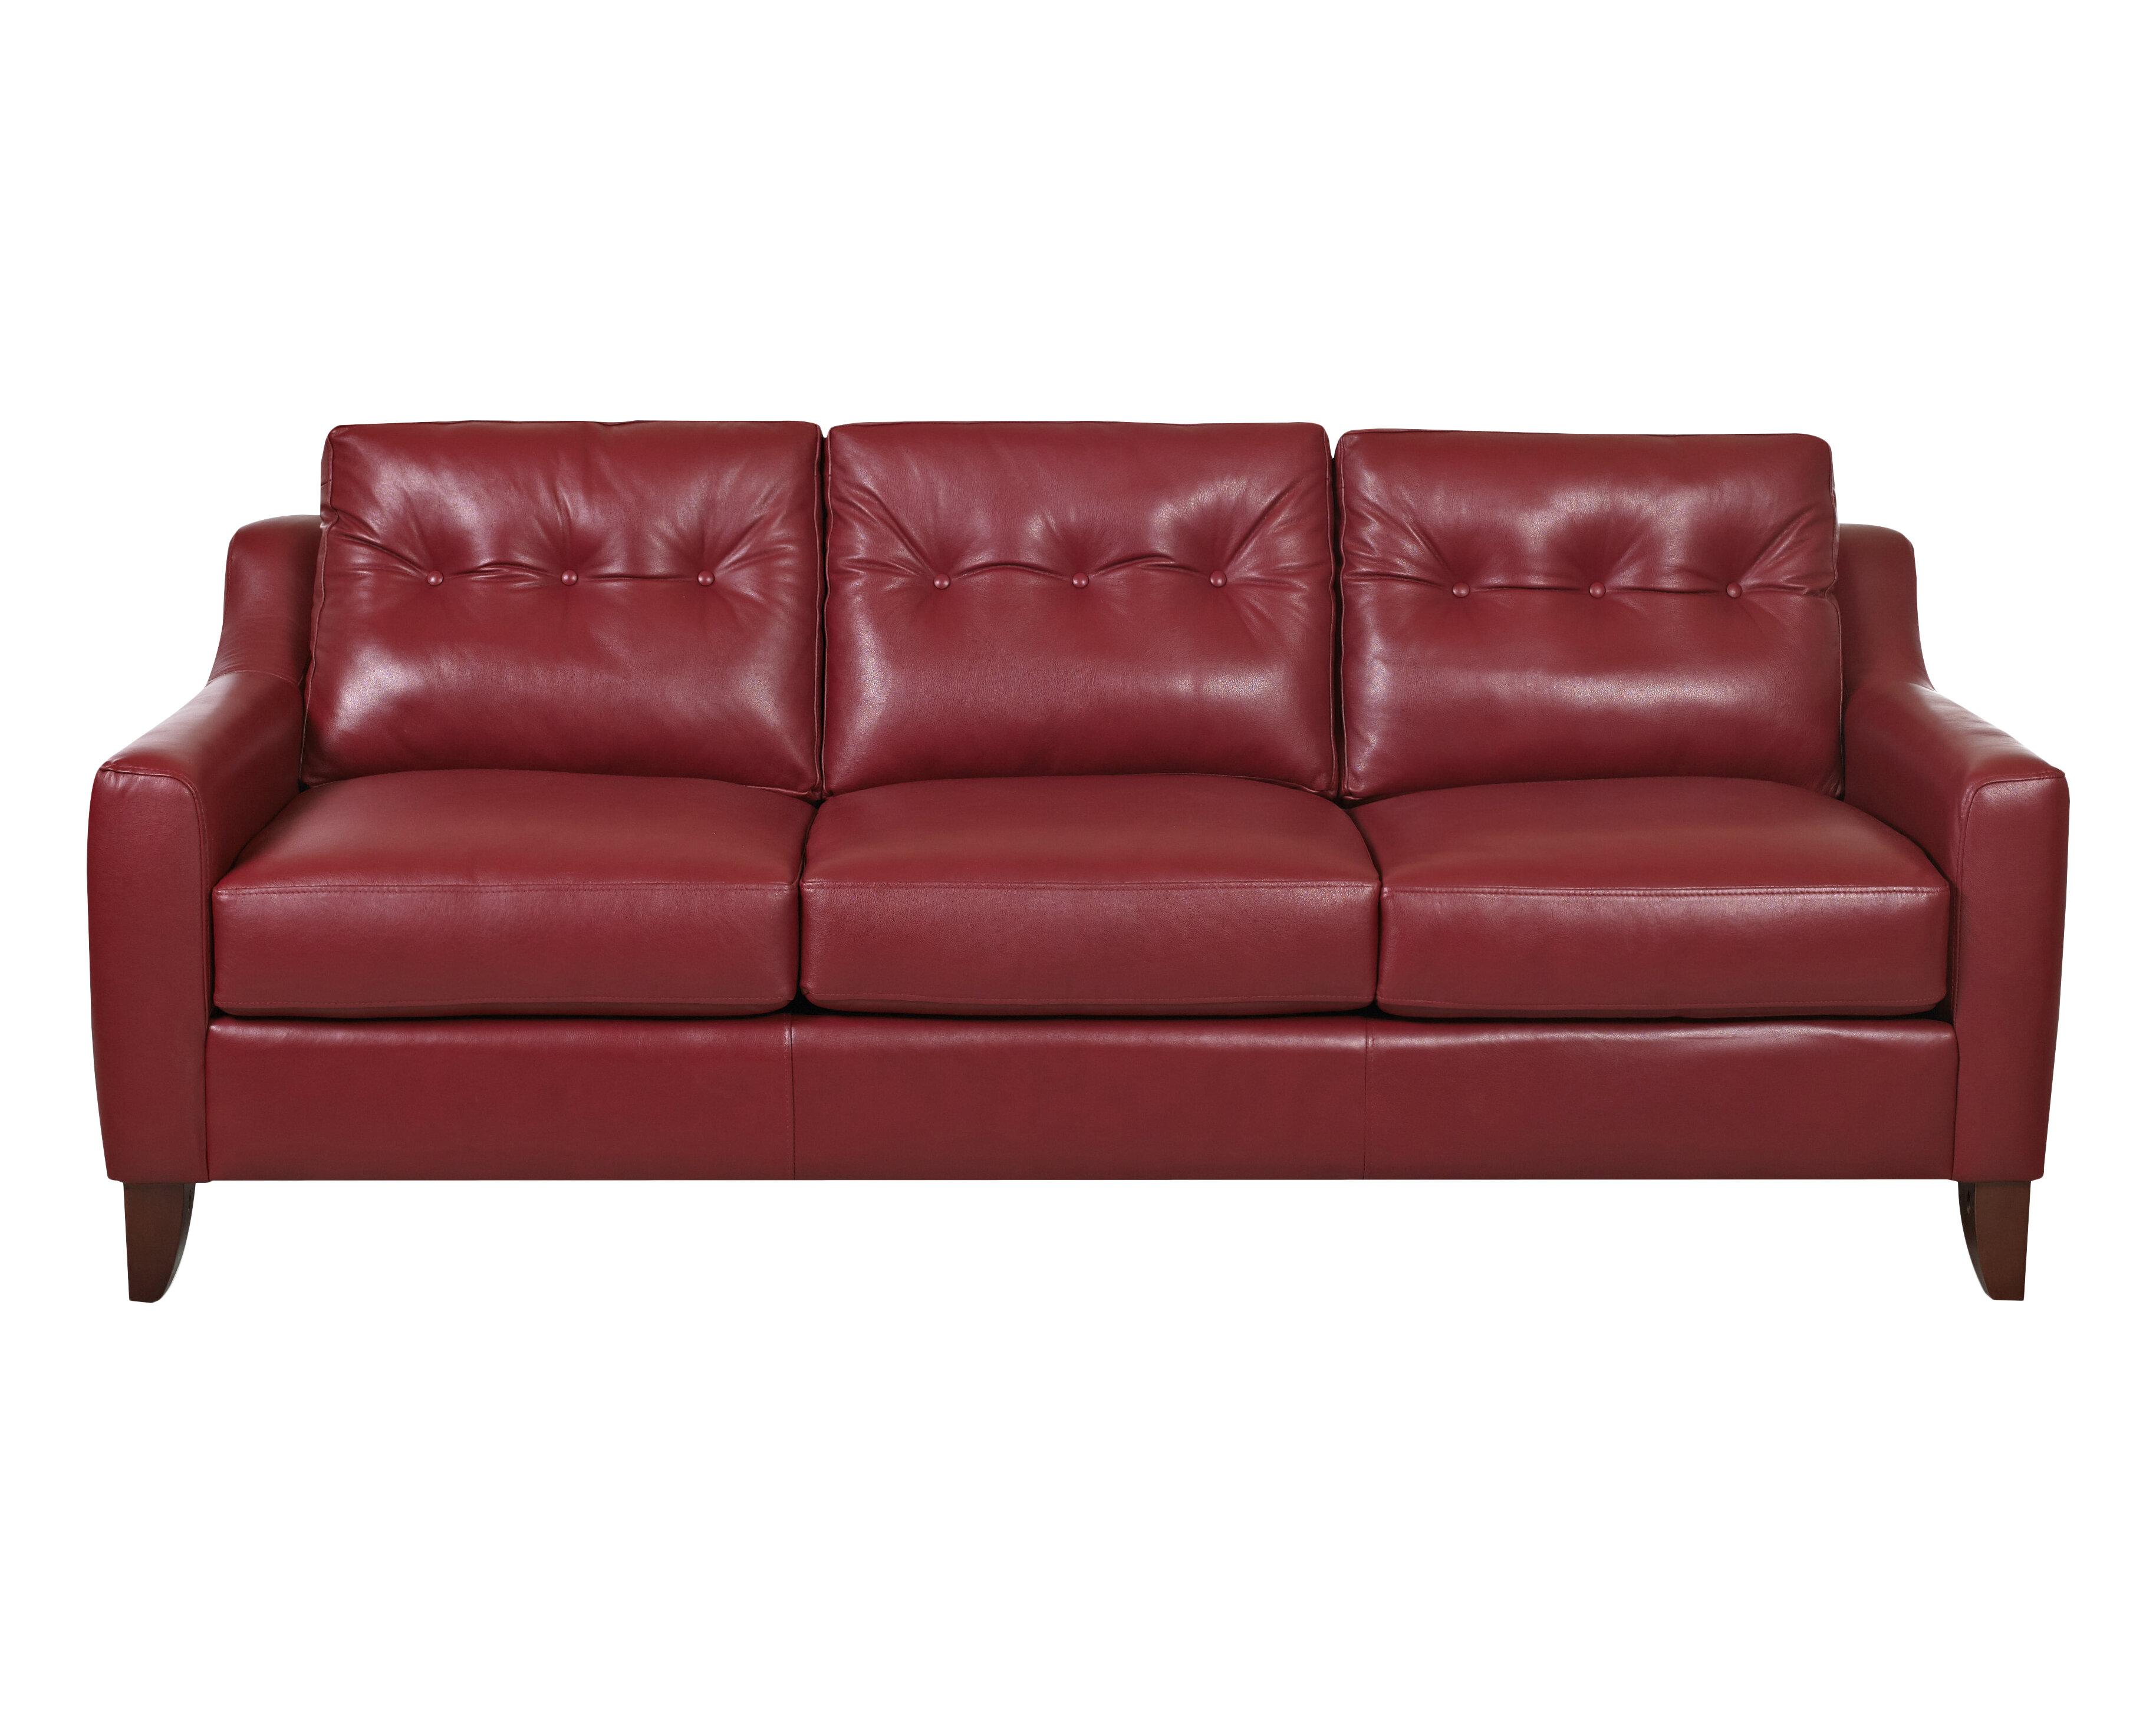 Trent Austin Design Levell Leather Sofa & Reviews | Wayfair